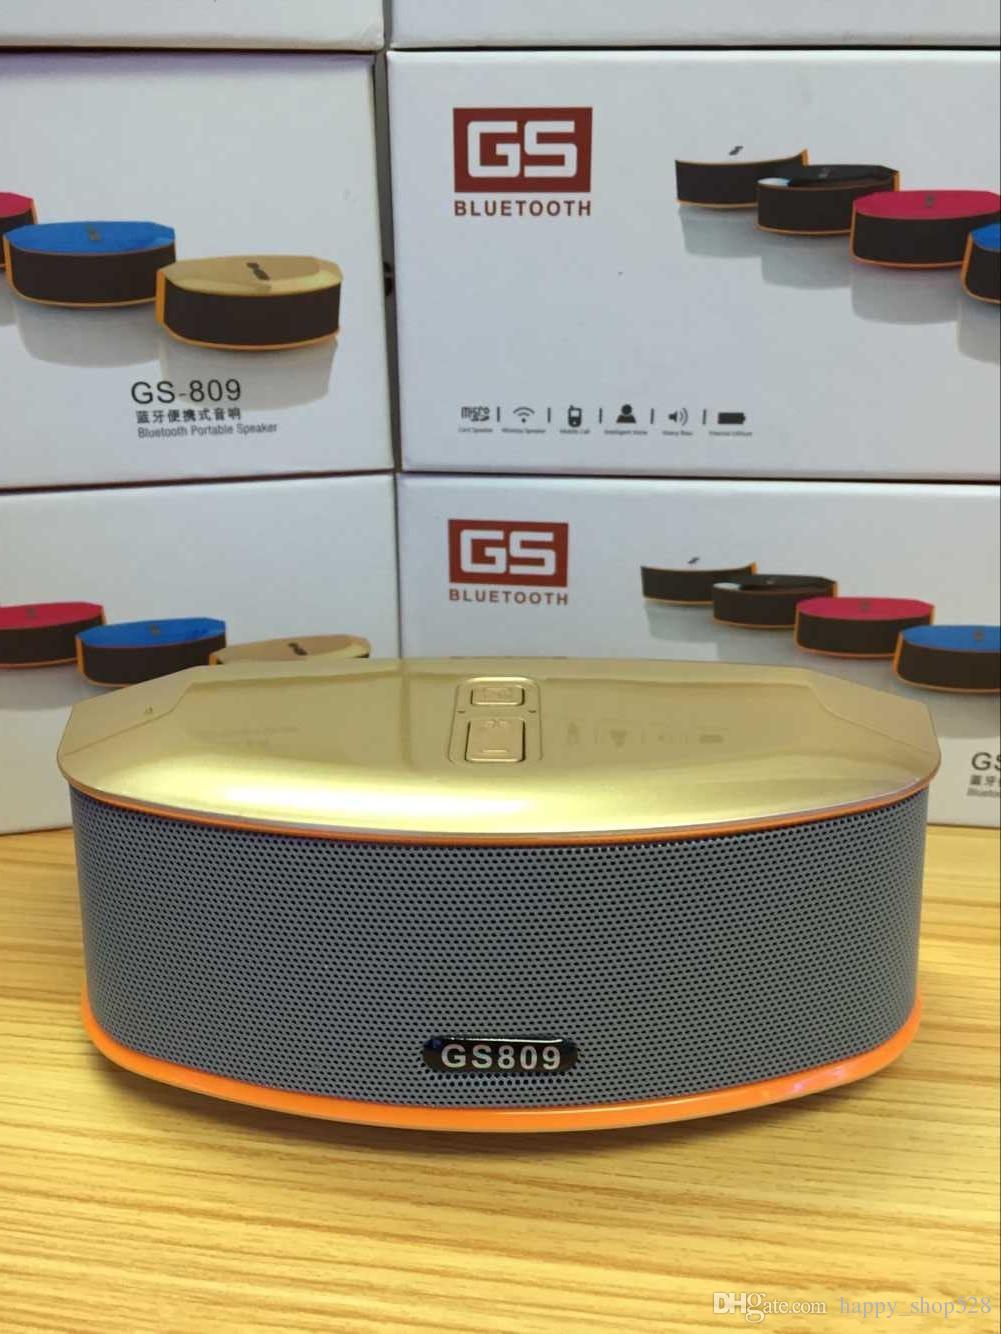 Altavoz Bluetooth mejor Calidad GS809 Bluetooth Altavoz portátil Lector de tarjetas TF Manos libres Bluetooth Altavoz inalámbrico Reproductor de audio portátil USB